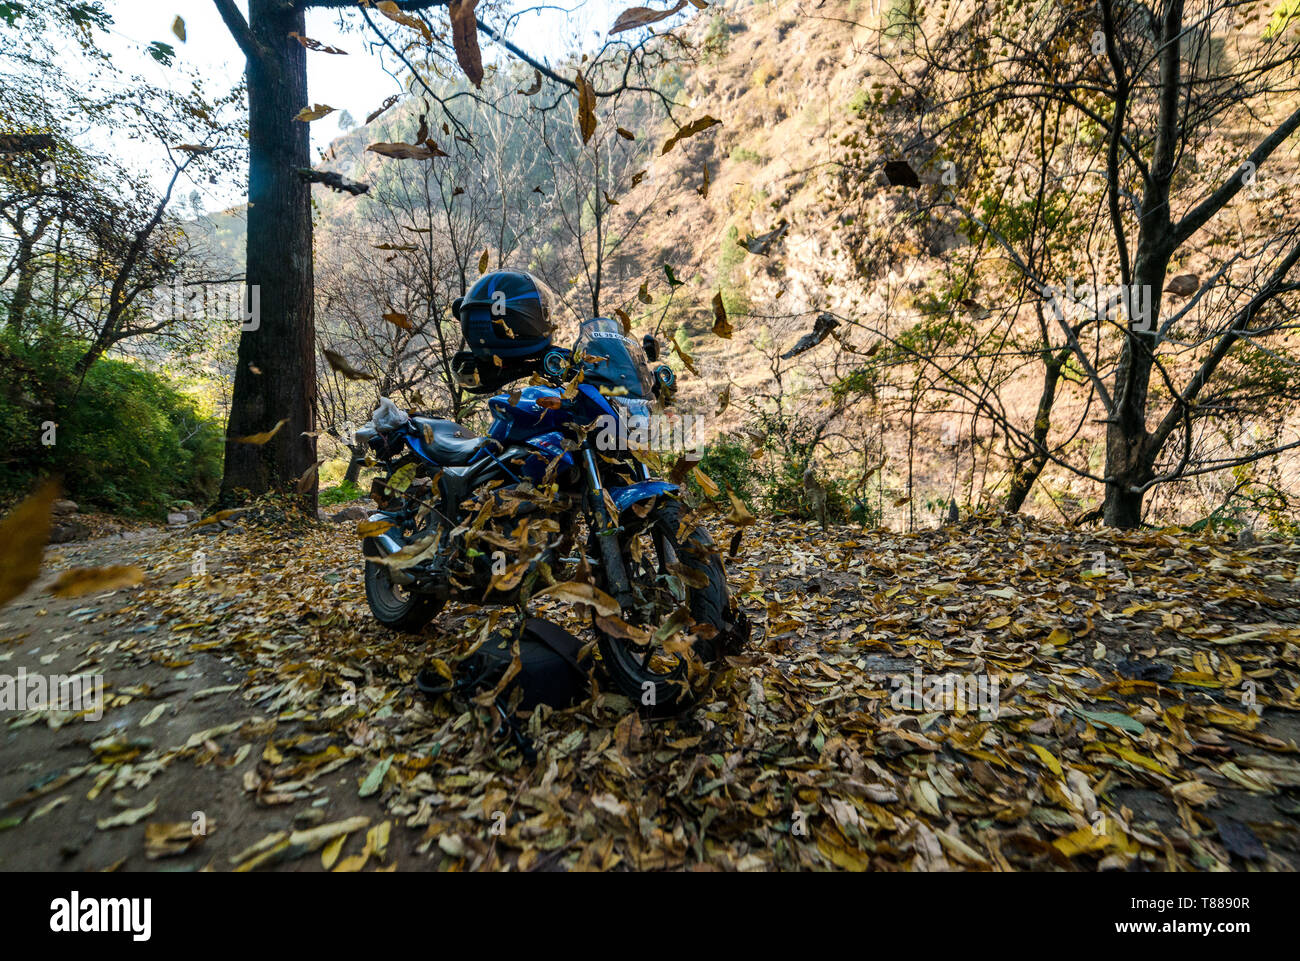 Kullu, Himachal Pradesh, India - December 02, 2018 : Motorcycle in Autumn season - - Stock Image